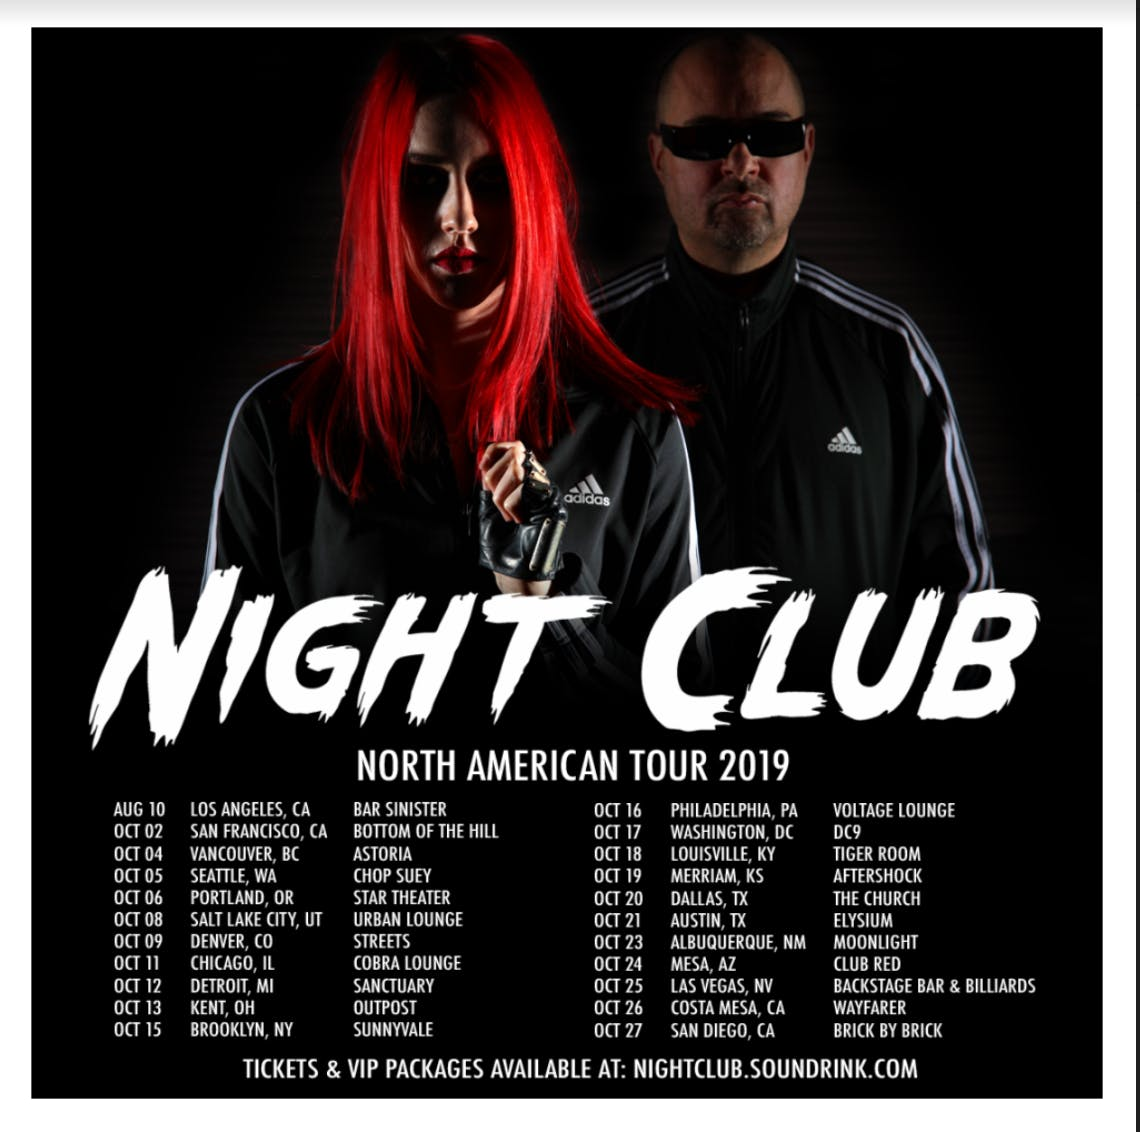 Chop Suey | Live Music Venue | Seattle, WA